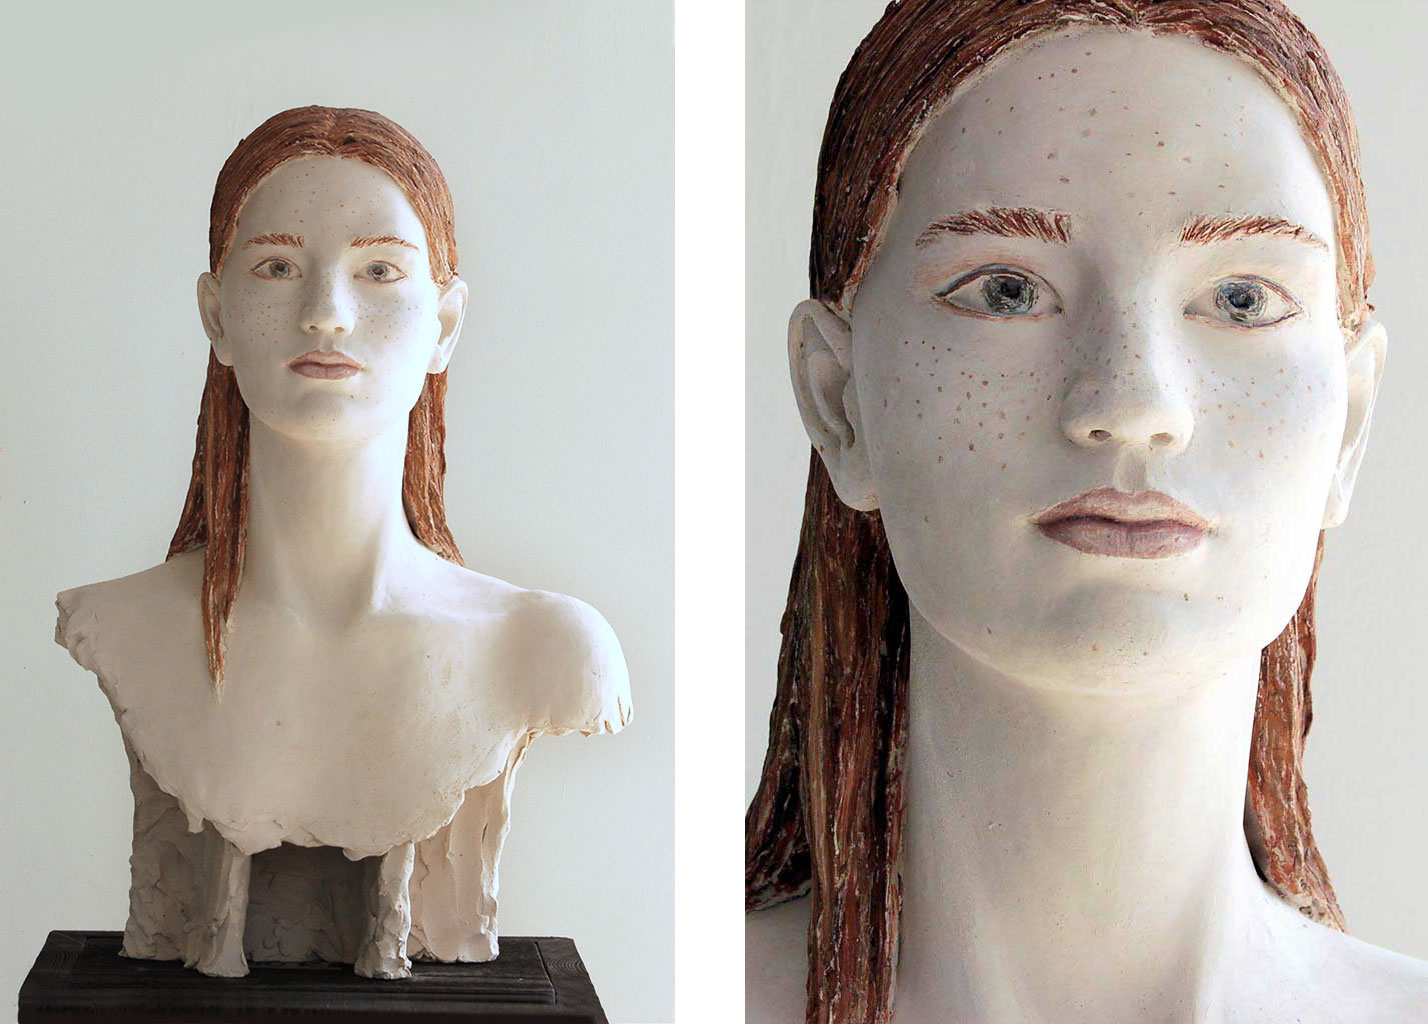 Lilly, Terrakotta engobiert, 50x35x25 cm, 2020